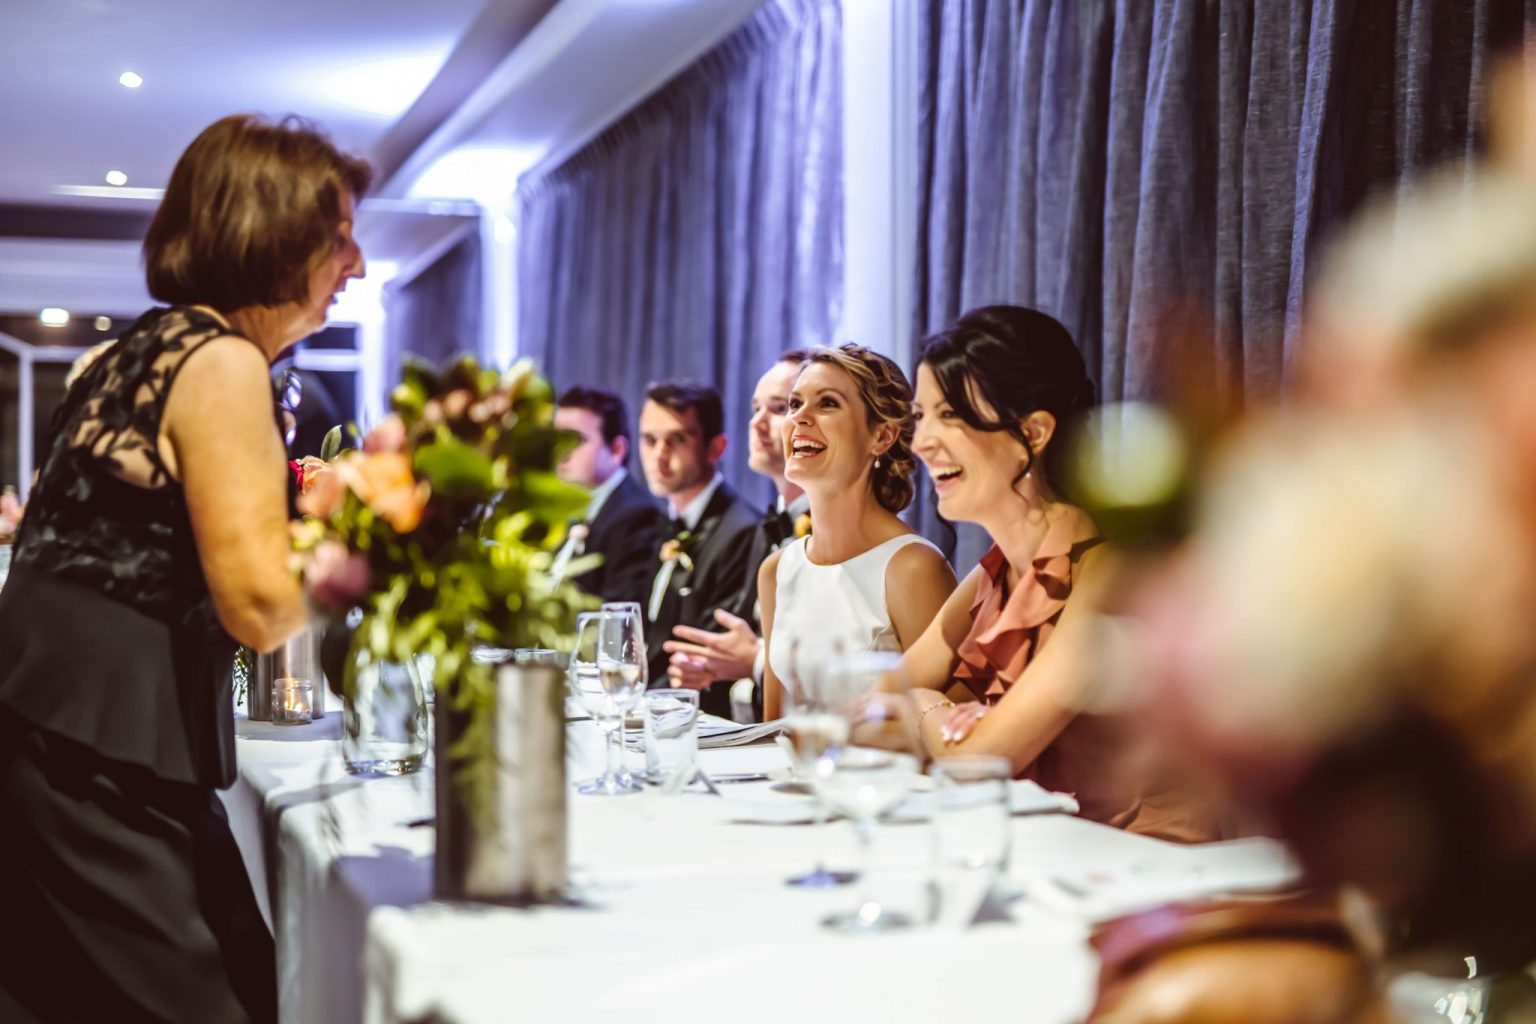 Bridal Party table at a wedding